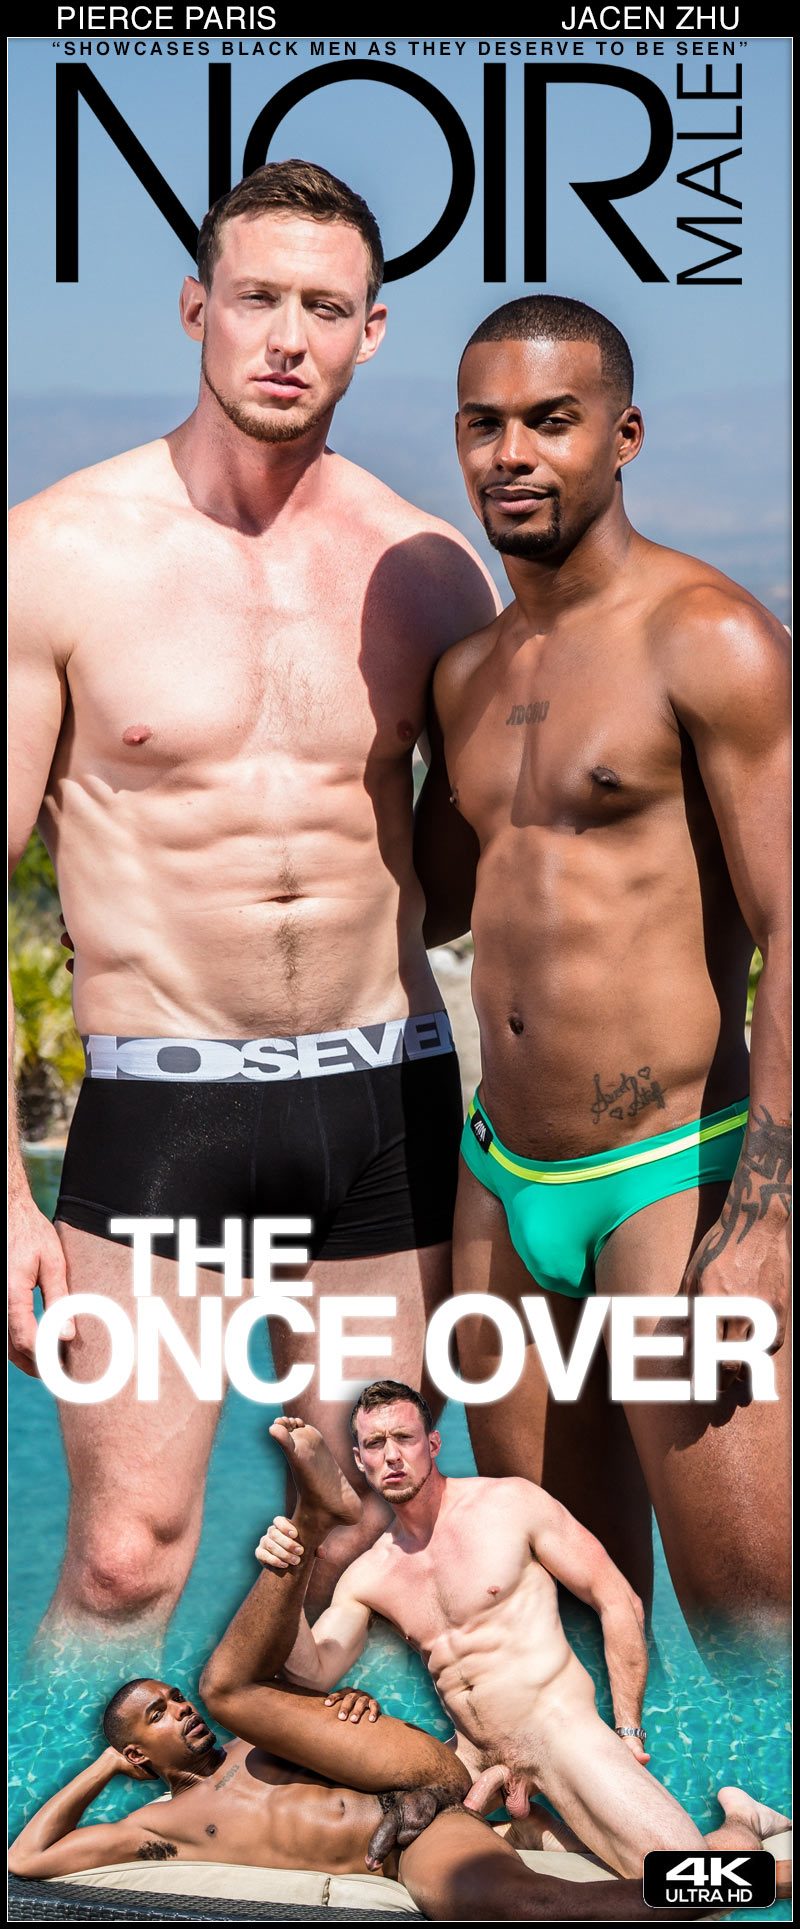 The Once Over (Pierce Paris and Jacen Zhu Flip-Fuck) at Noir Male